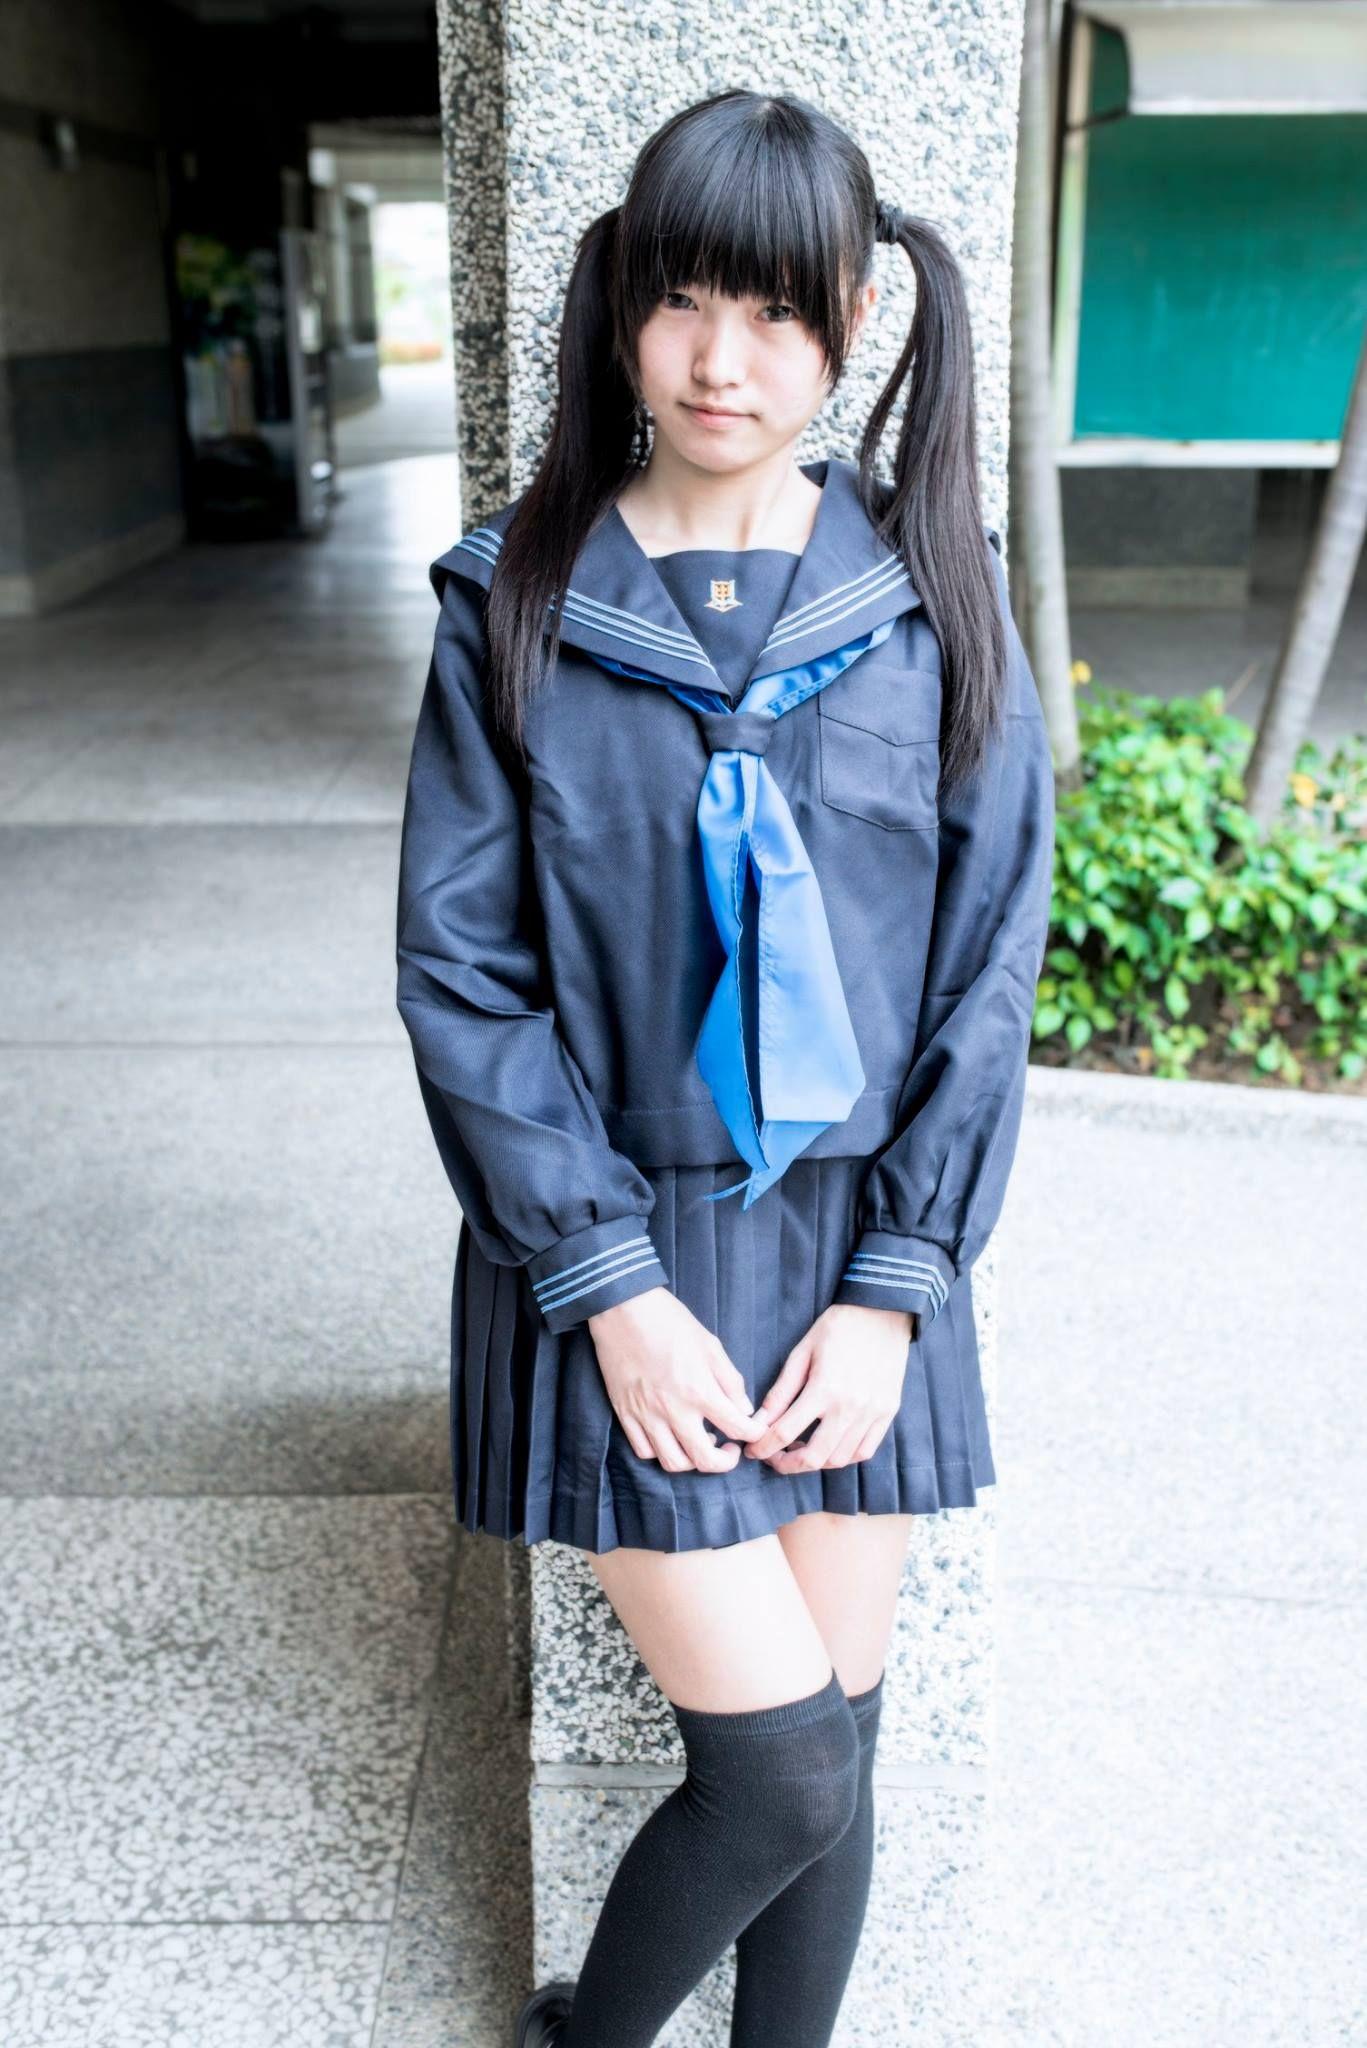 japanese-school-girls-movies-jane-margolis-nude-xxx